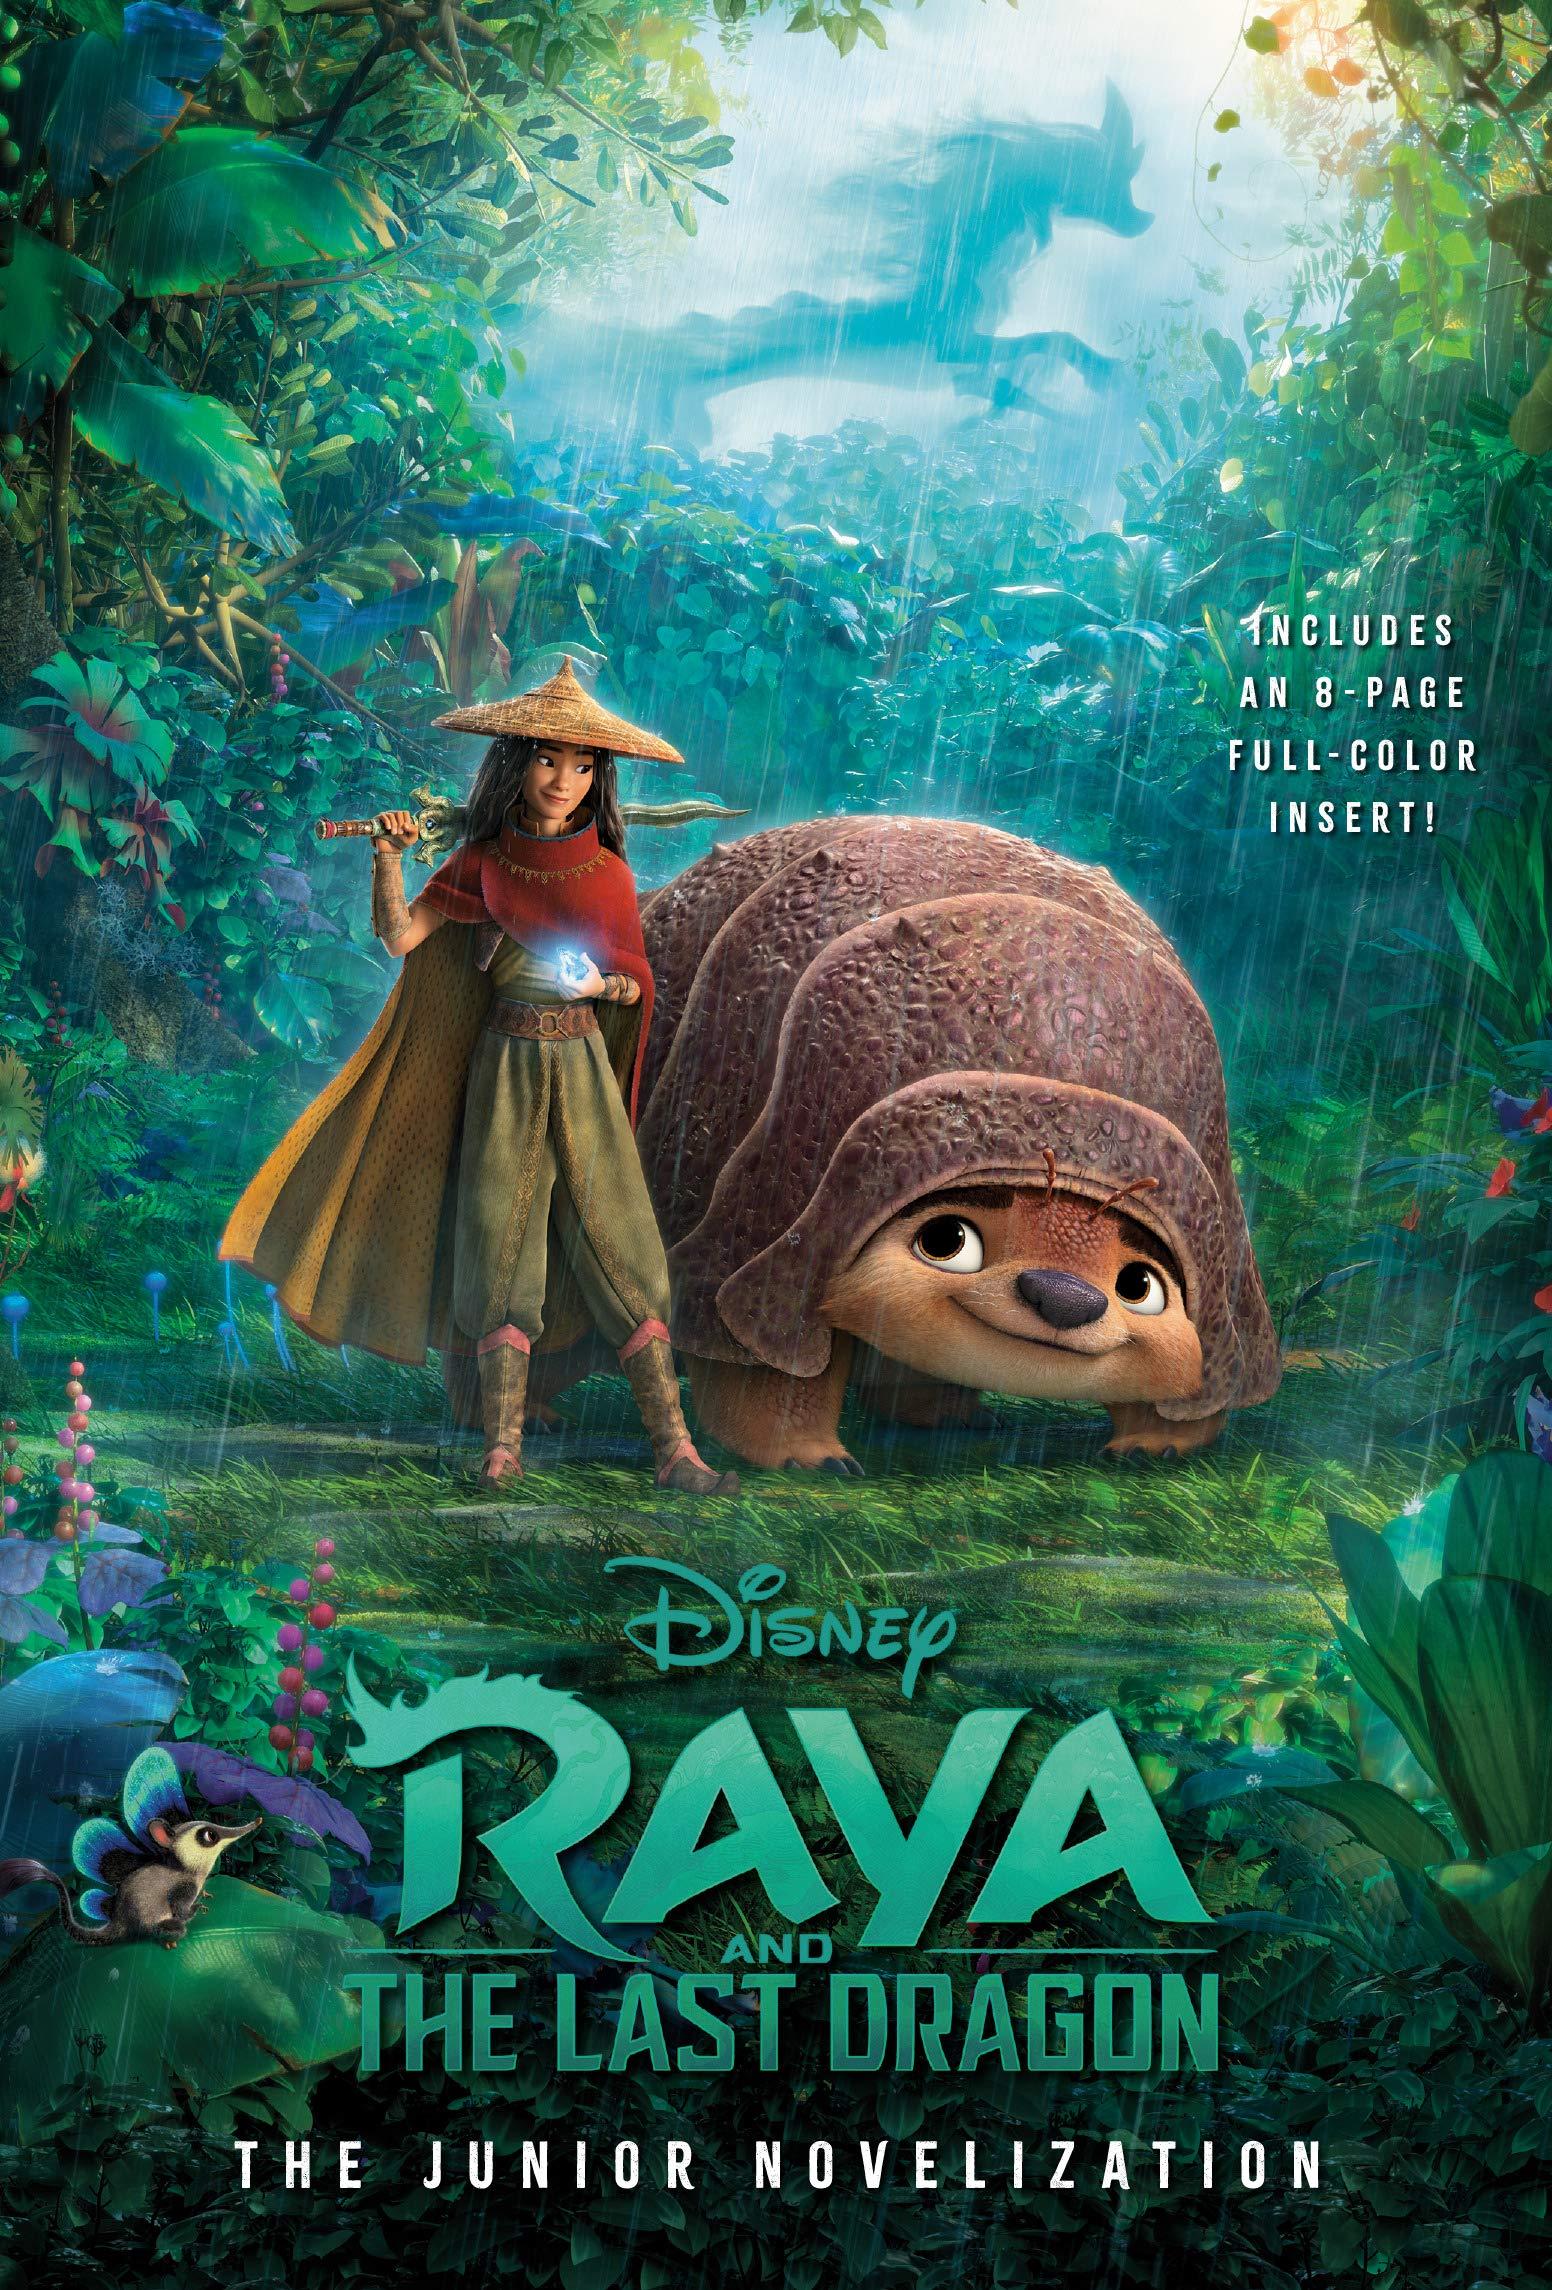 Raya and the Last Dragon: The Junior Novelization (Disney Raya and the Last  Dragon): RH Disney: 9780736441094: Amazon.com: Books